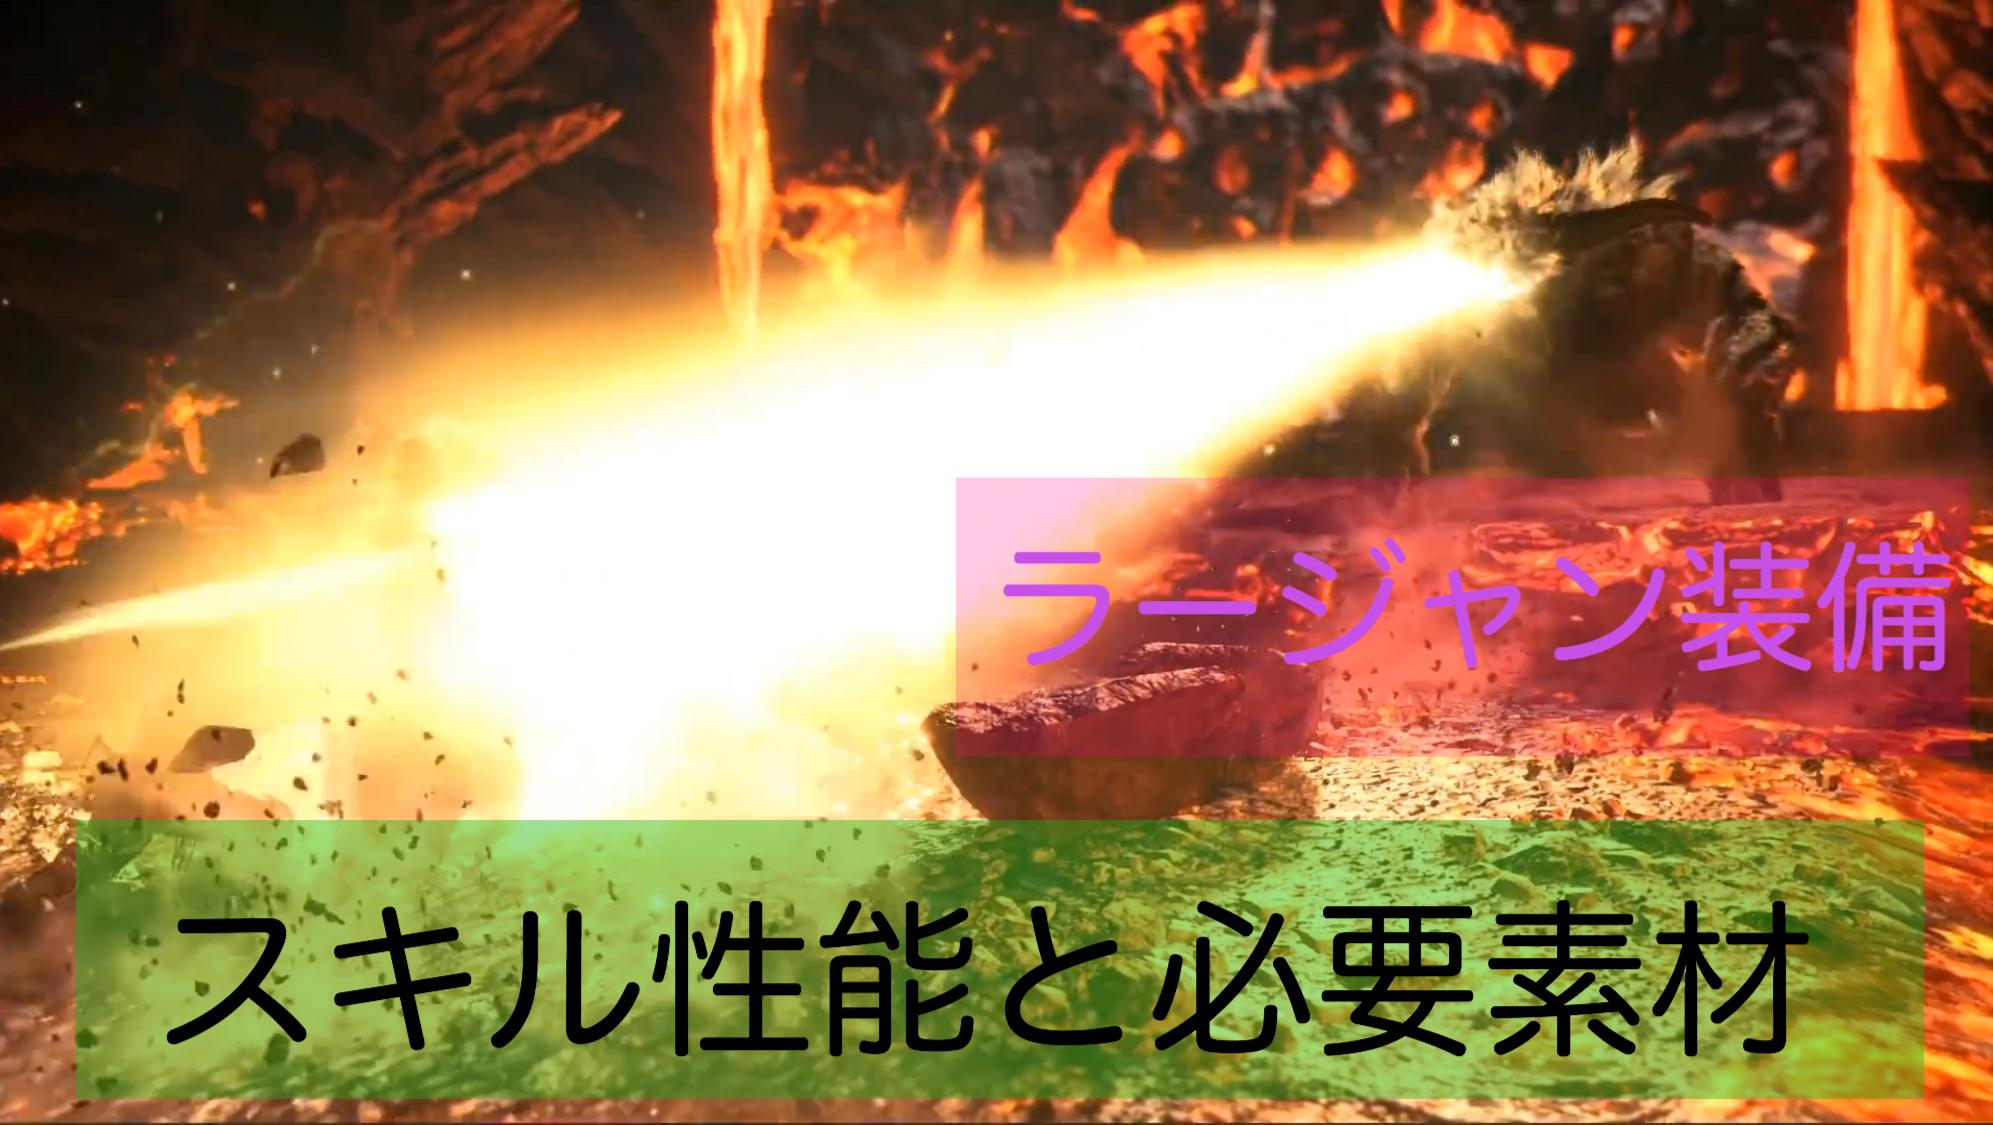 【MHWアイスボーン】ラージャン装備(防具)性能と必要素材まとめ